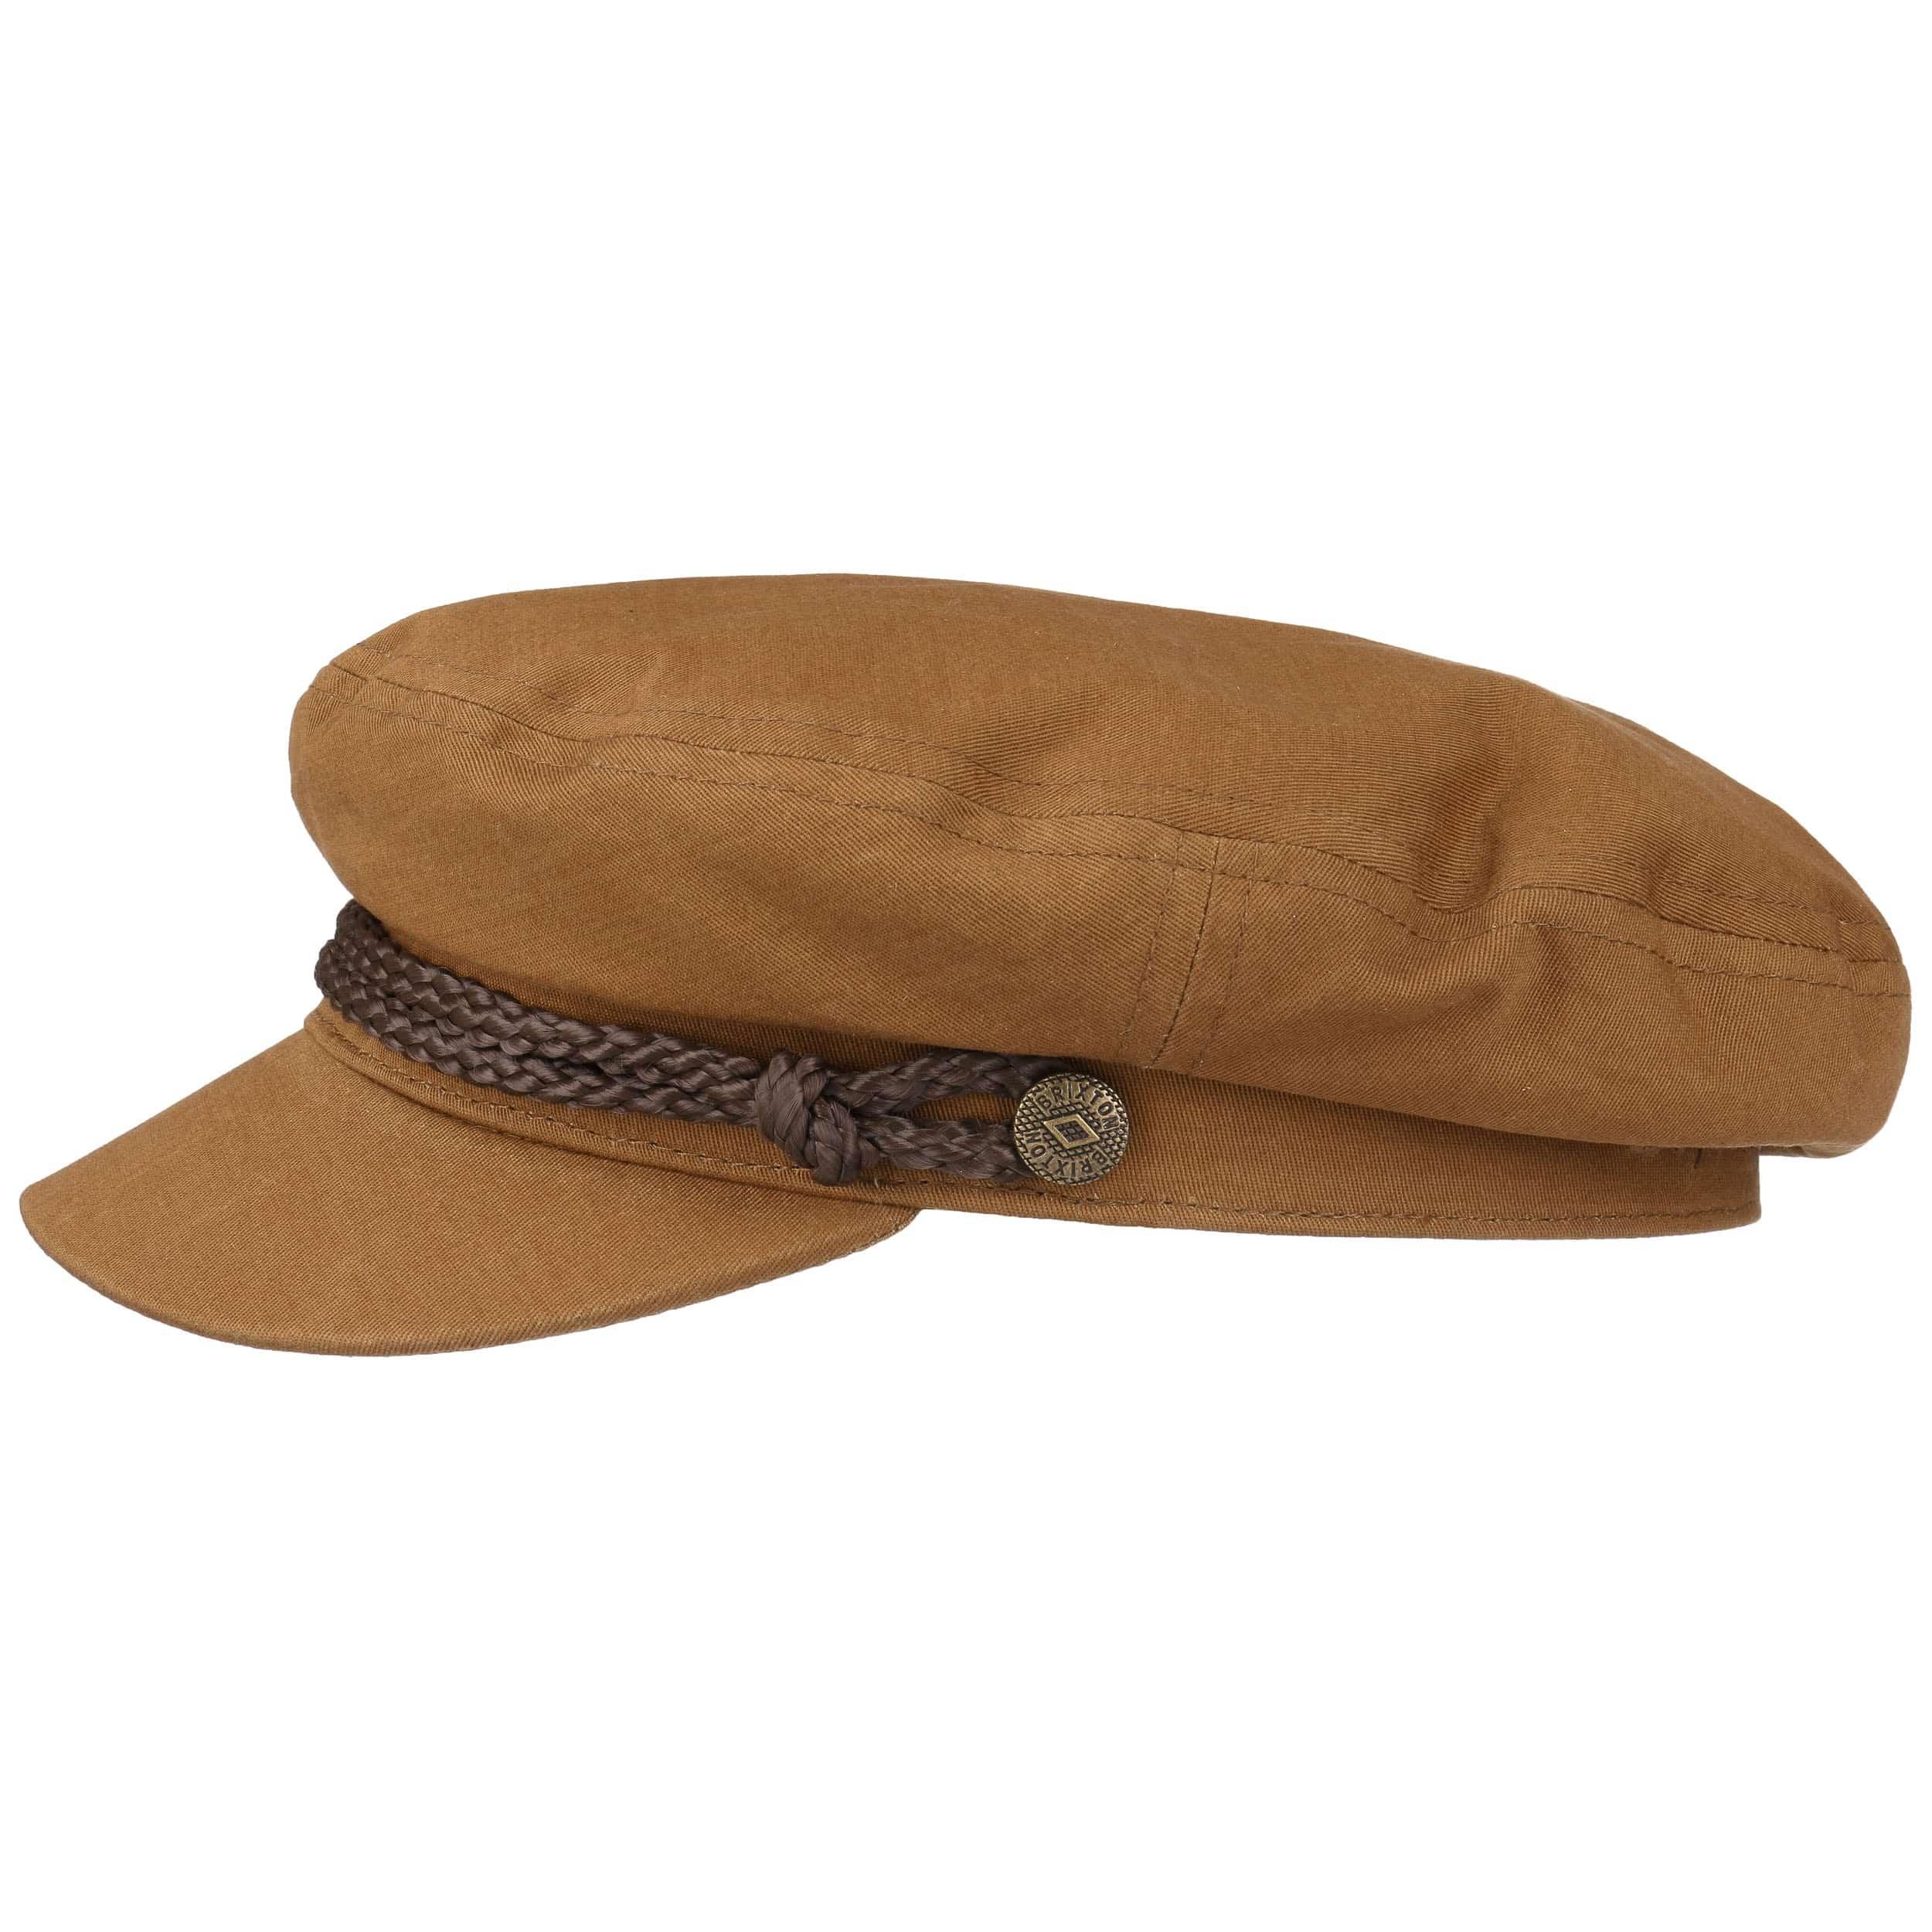 ... Fiddler Uni Fisherman´s Cap by Brixton - light brown 7 ... a8f4ec381643